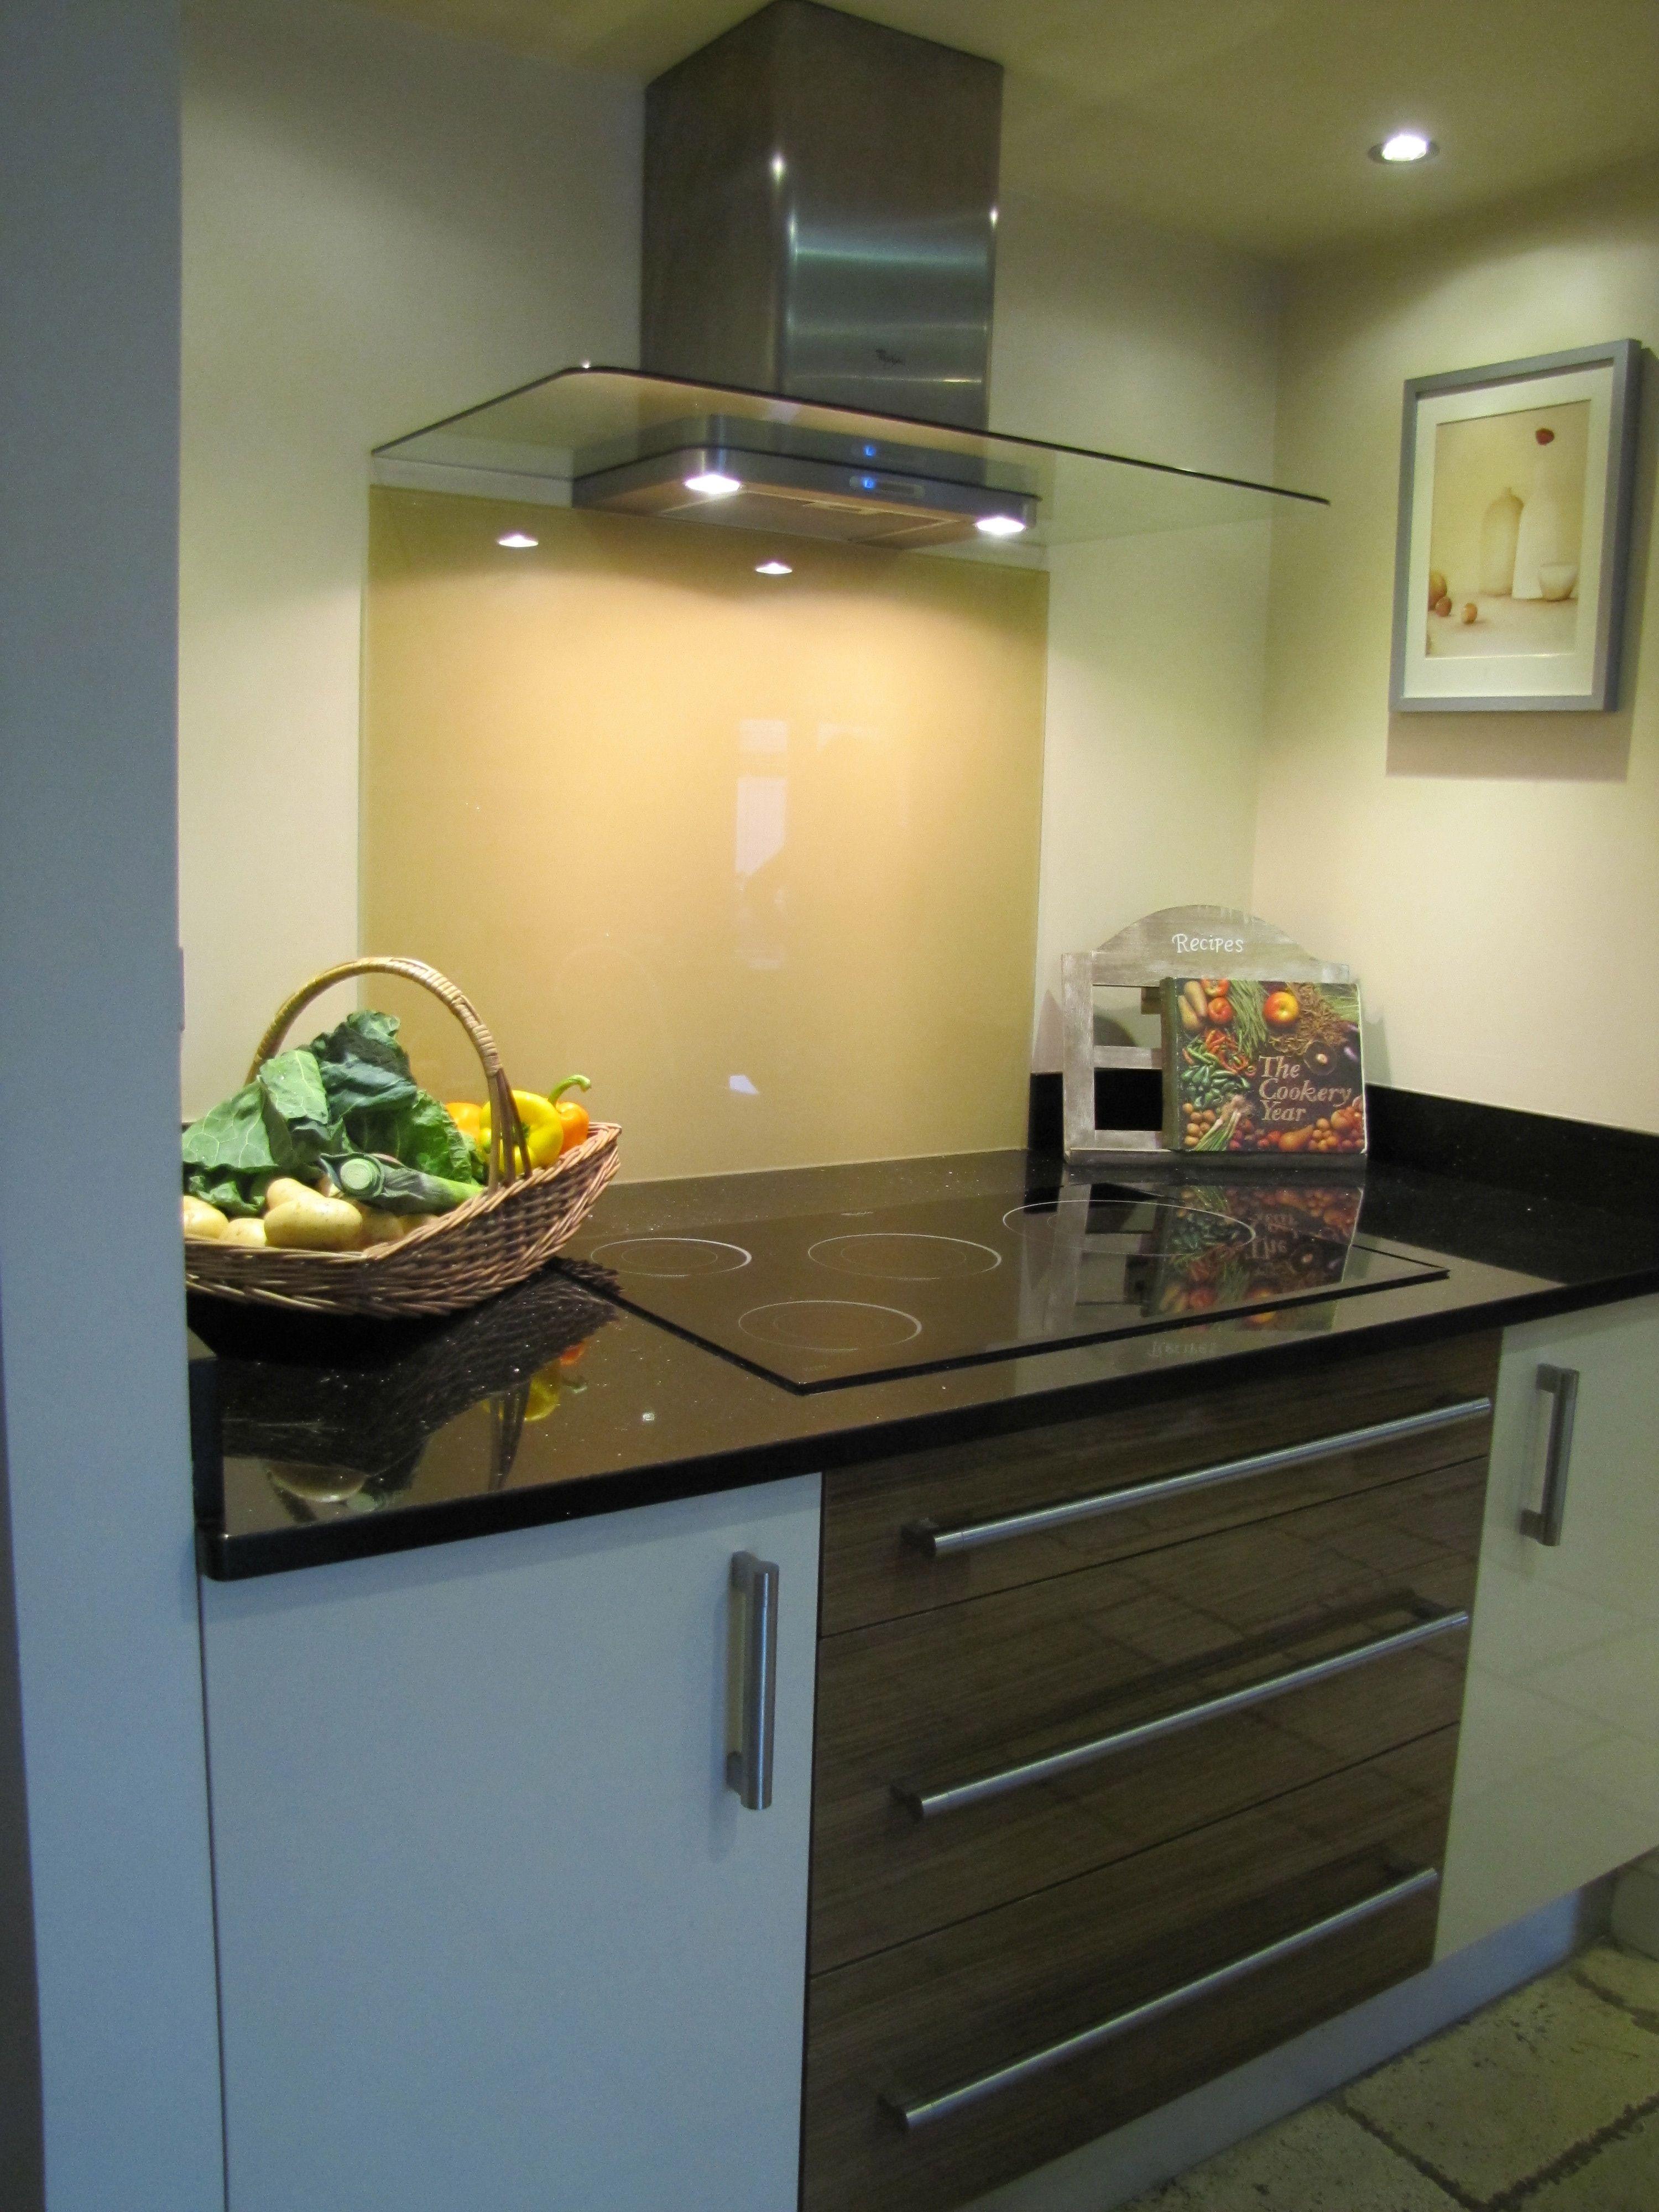 Crp Carpentry Whirlpool Induction Hob Fitted In Star Galaxy Granite Cream Glass Splashback Splashback Kitchen Home Decor